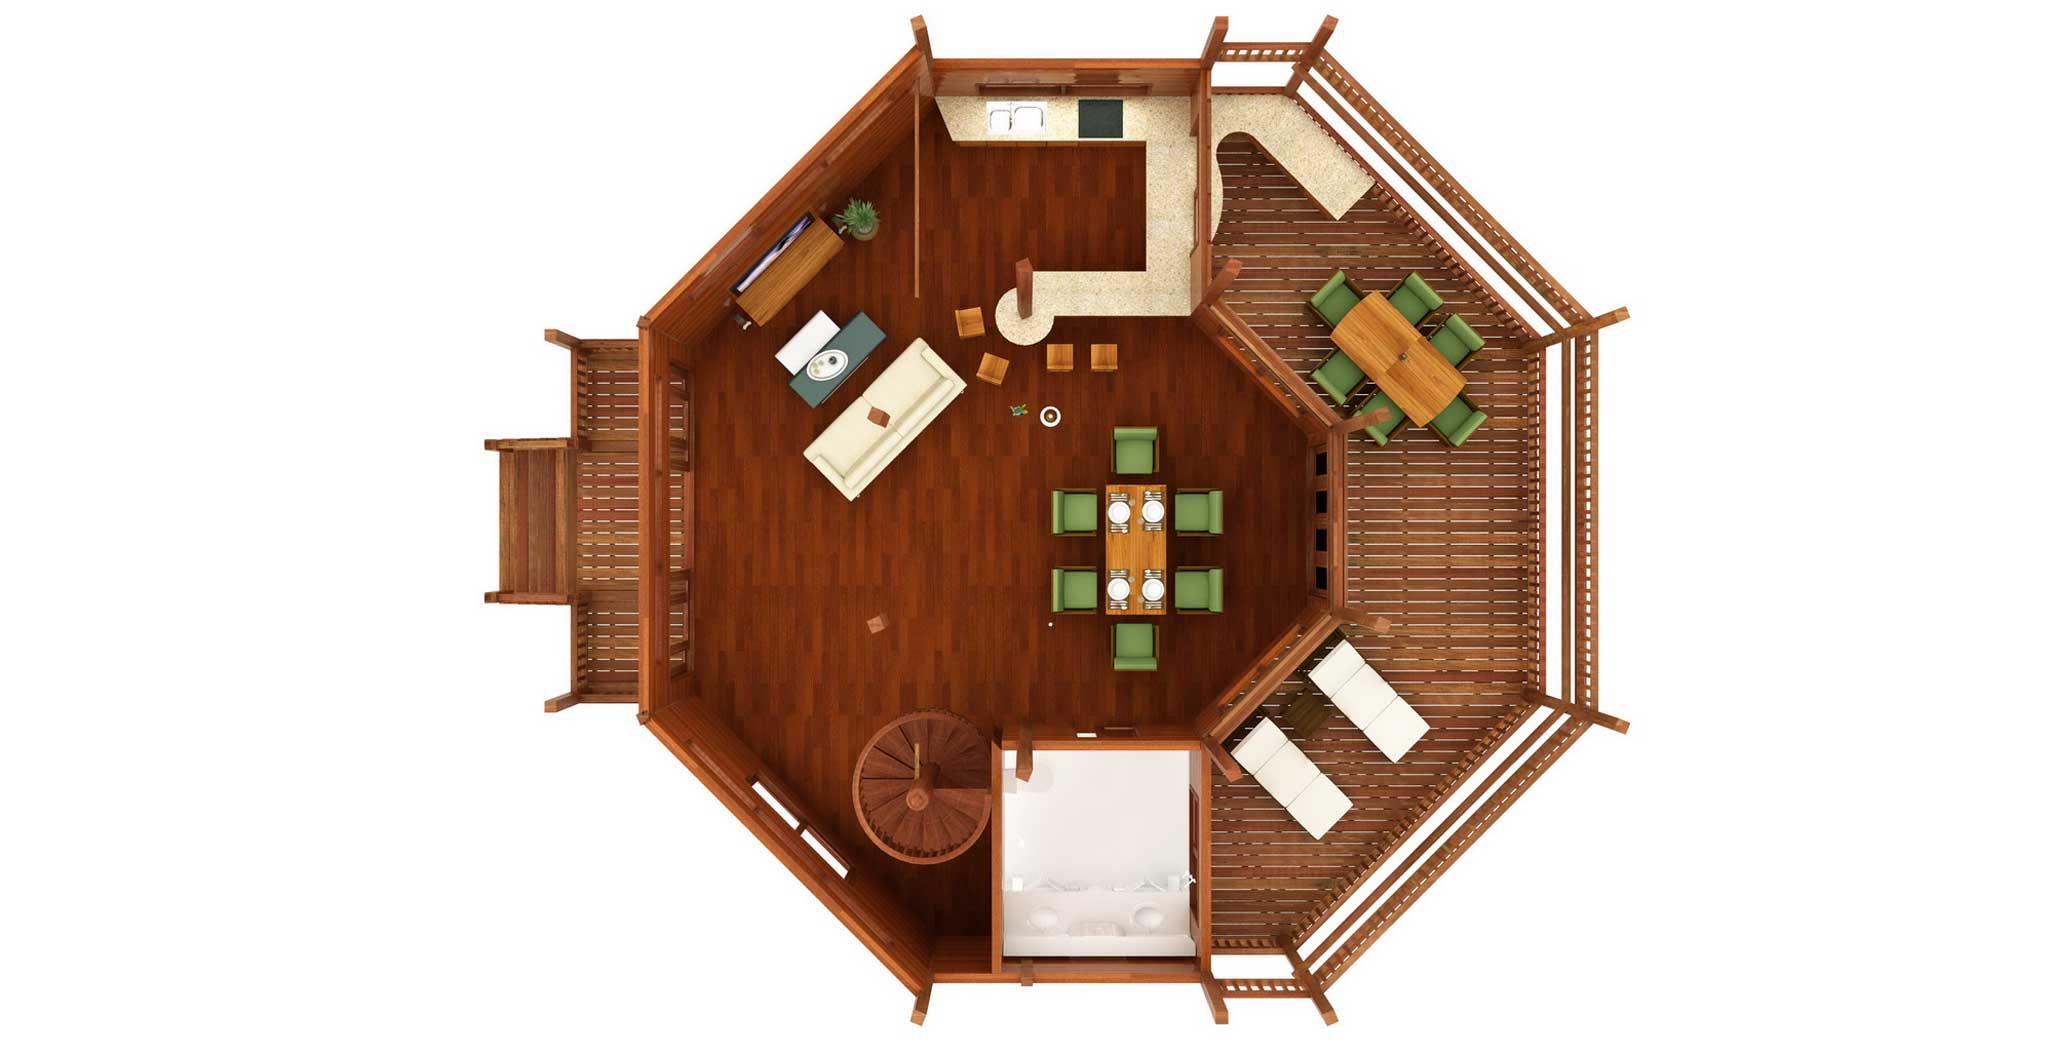 China cat design caribbean floor plans teak bali for Tropical house plans